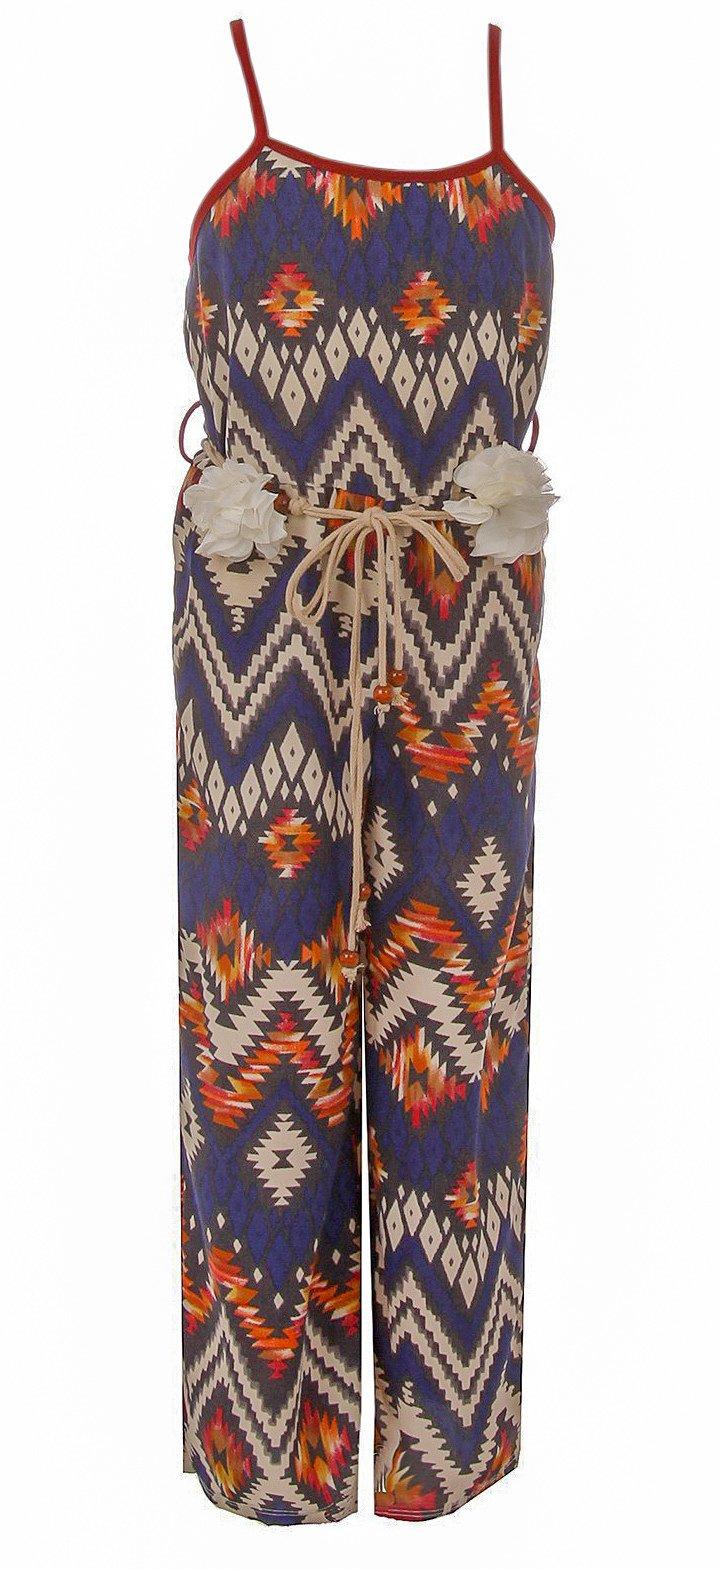 BNY Corner Little Girl Girls Jumpsuits Multi Pattern Romper Casual Summer Birthday Outfit Burgundy 6 JKS 2127